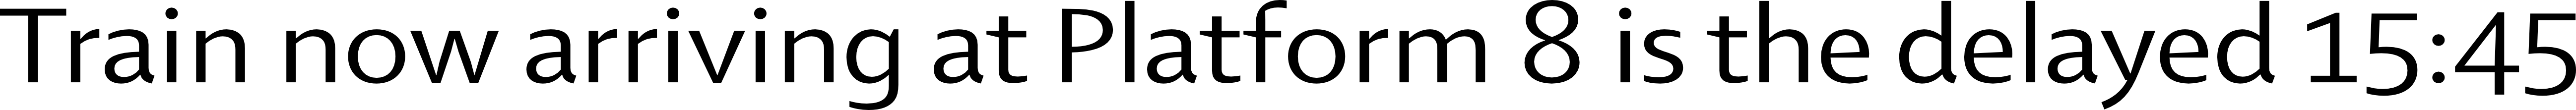 Image-six